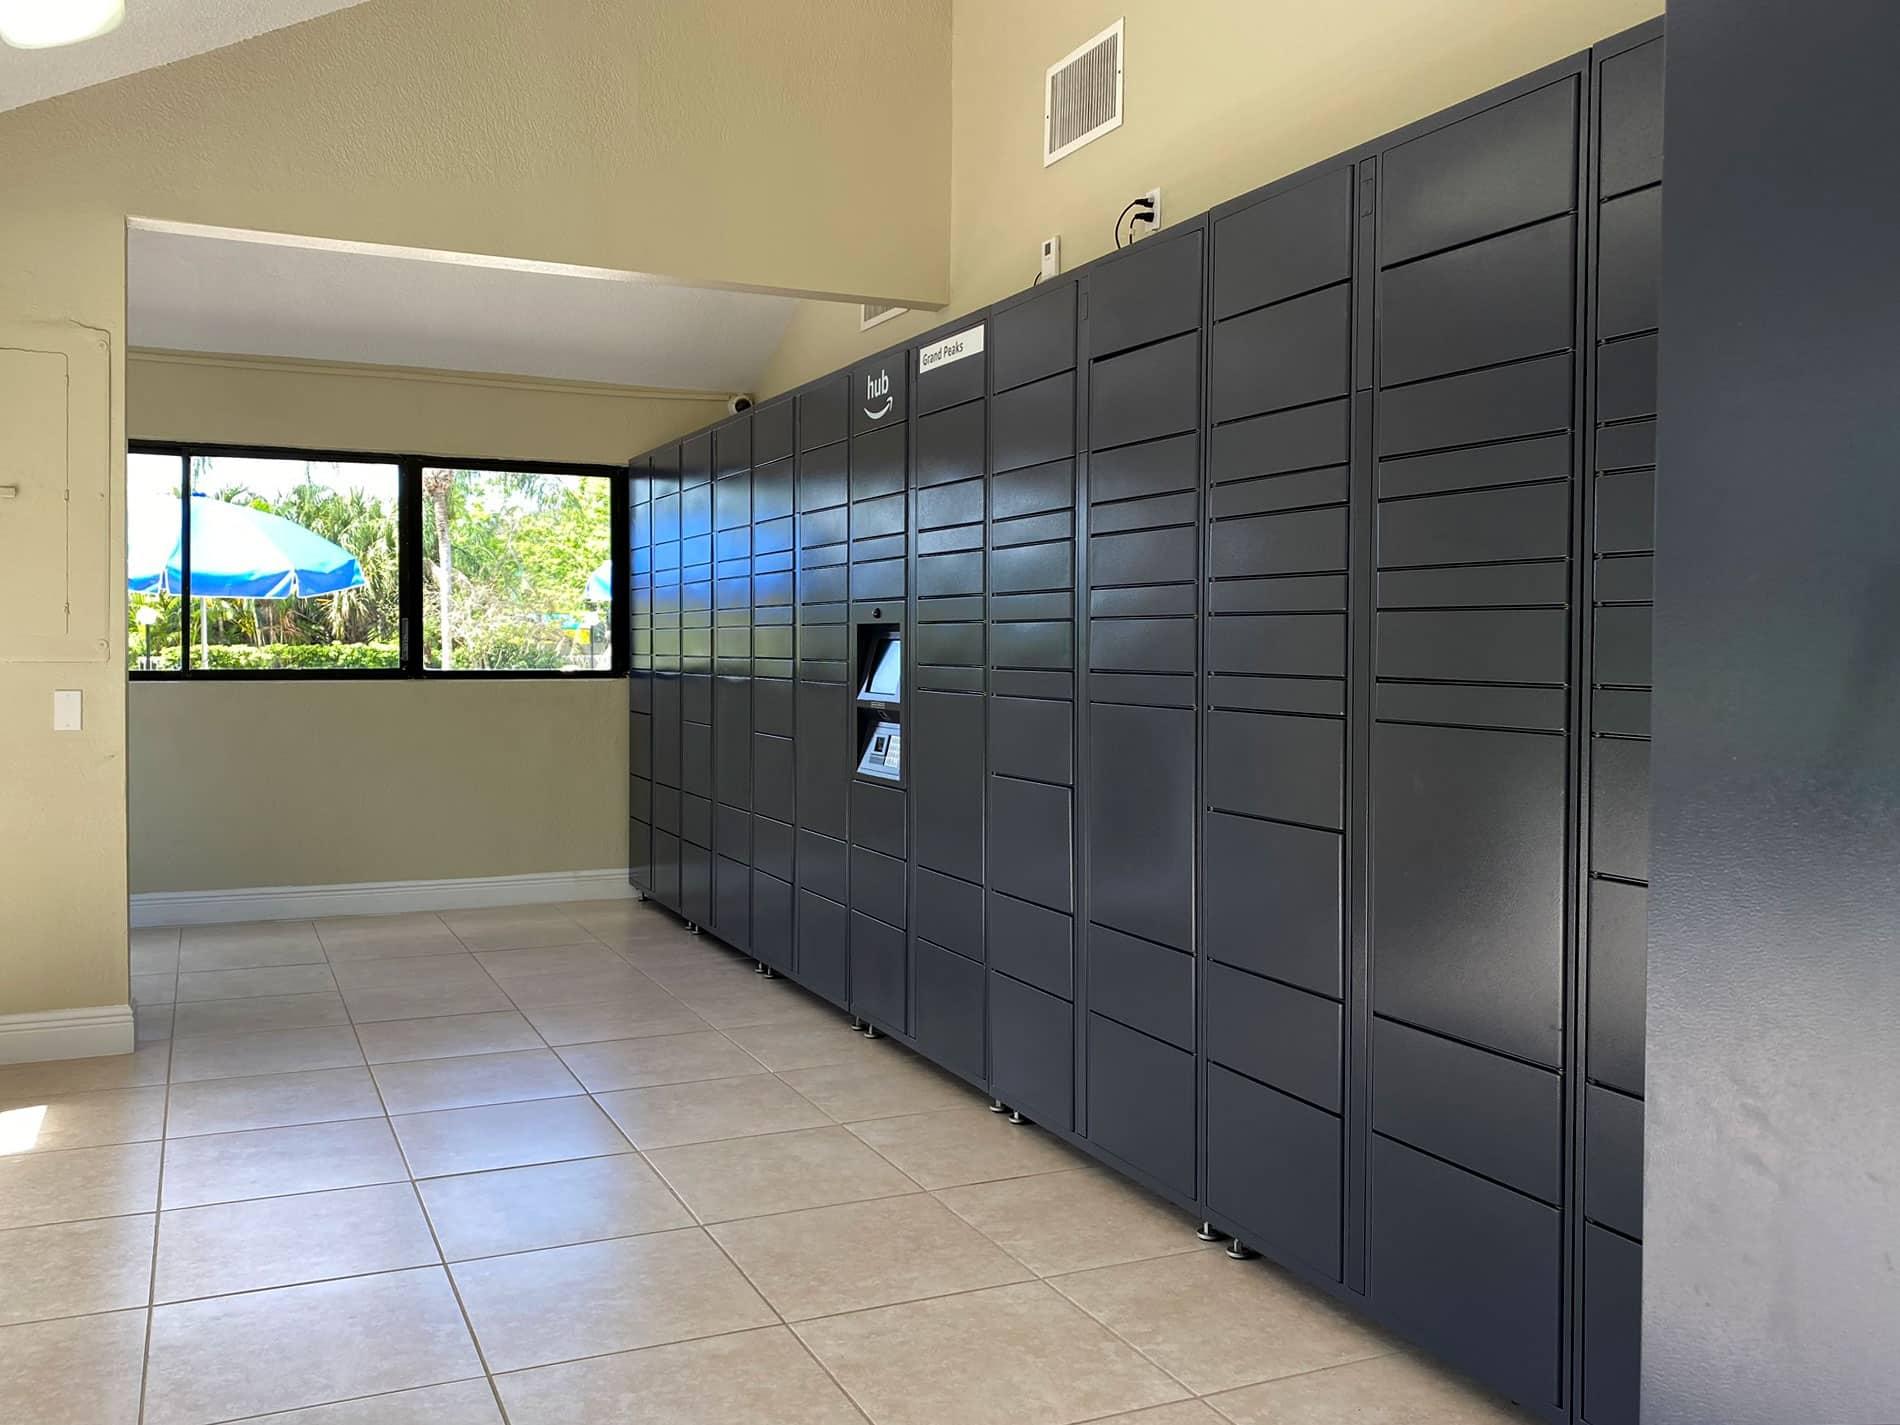 Amazon Package Lockers